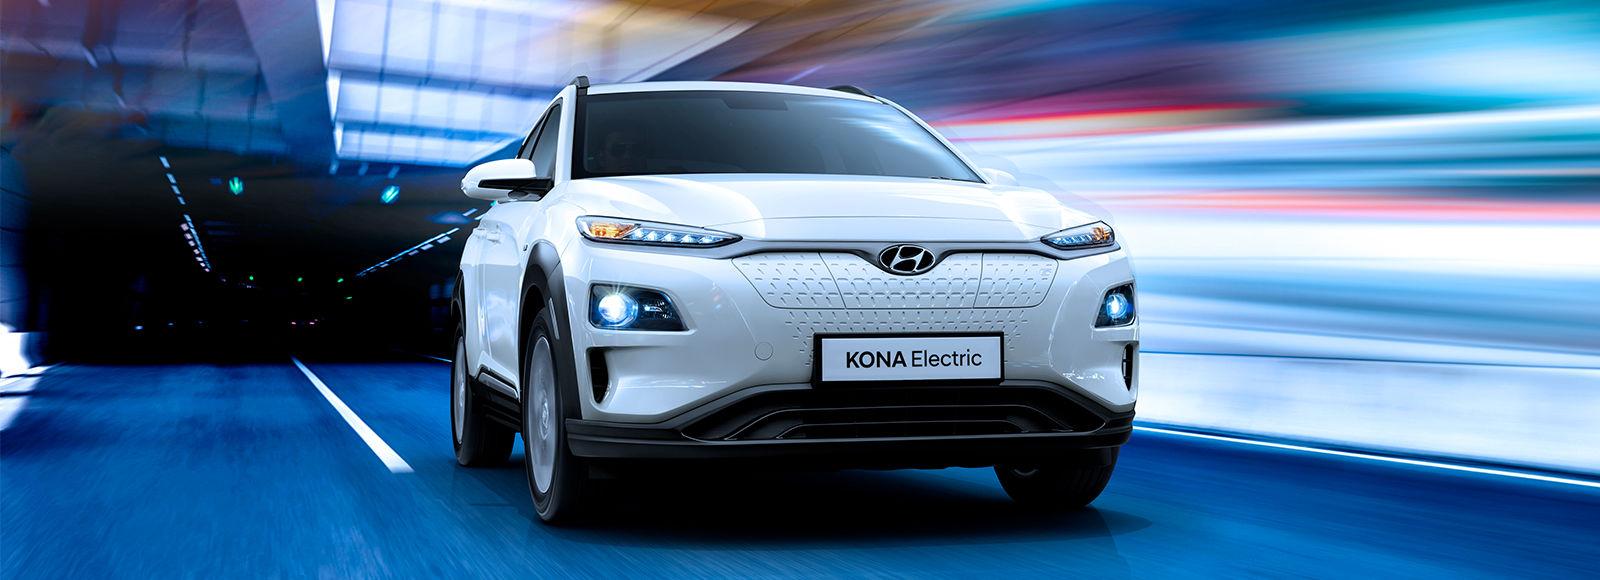 Hyundai Kona Electric Highlights Suv Hyundai Motor India